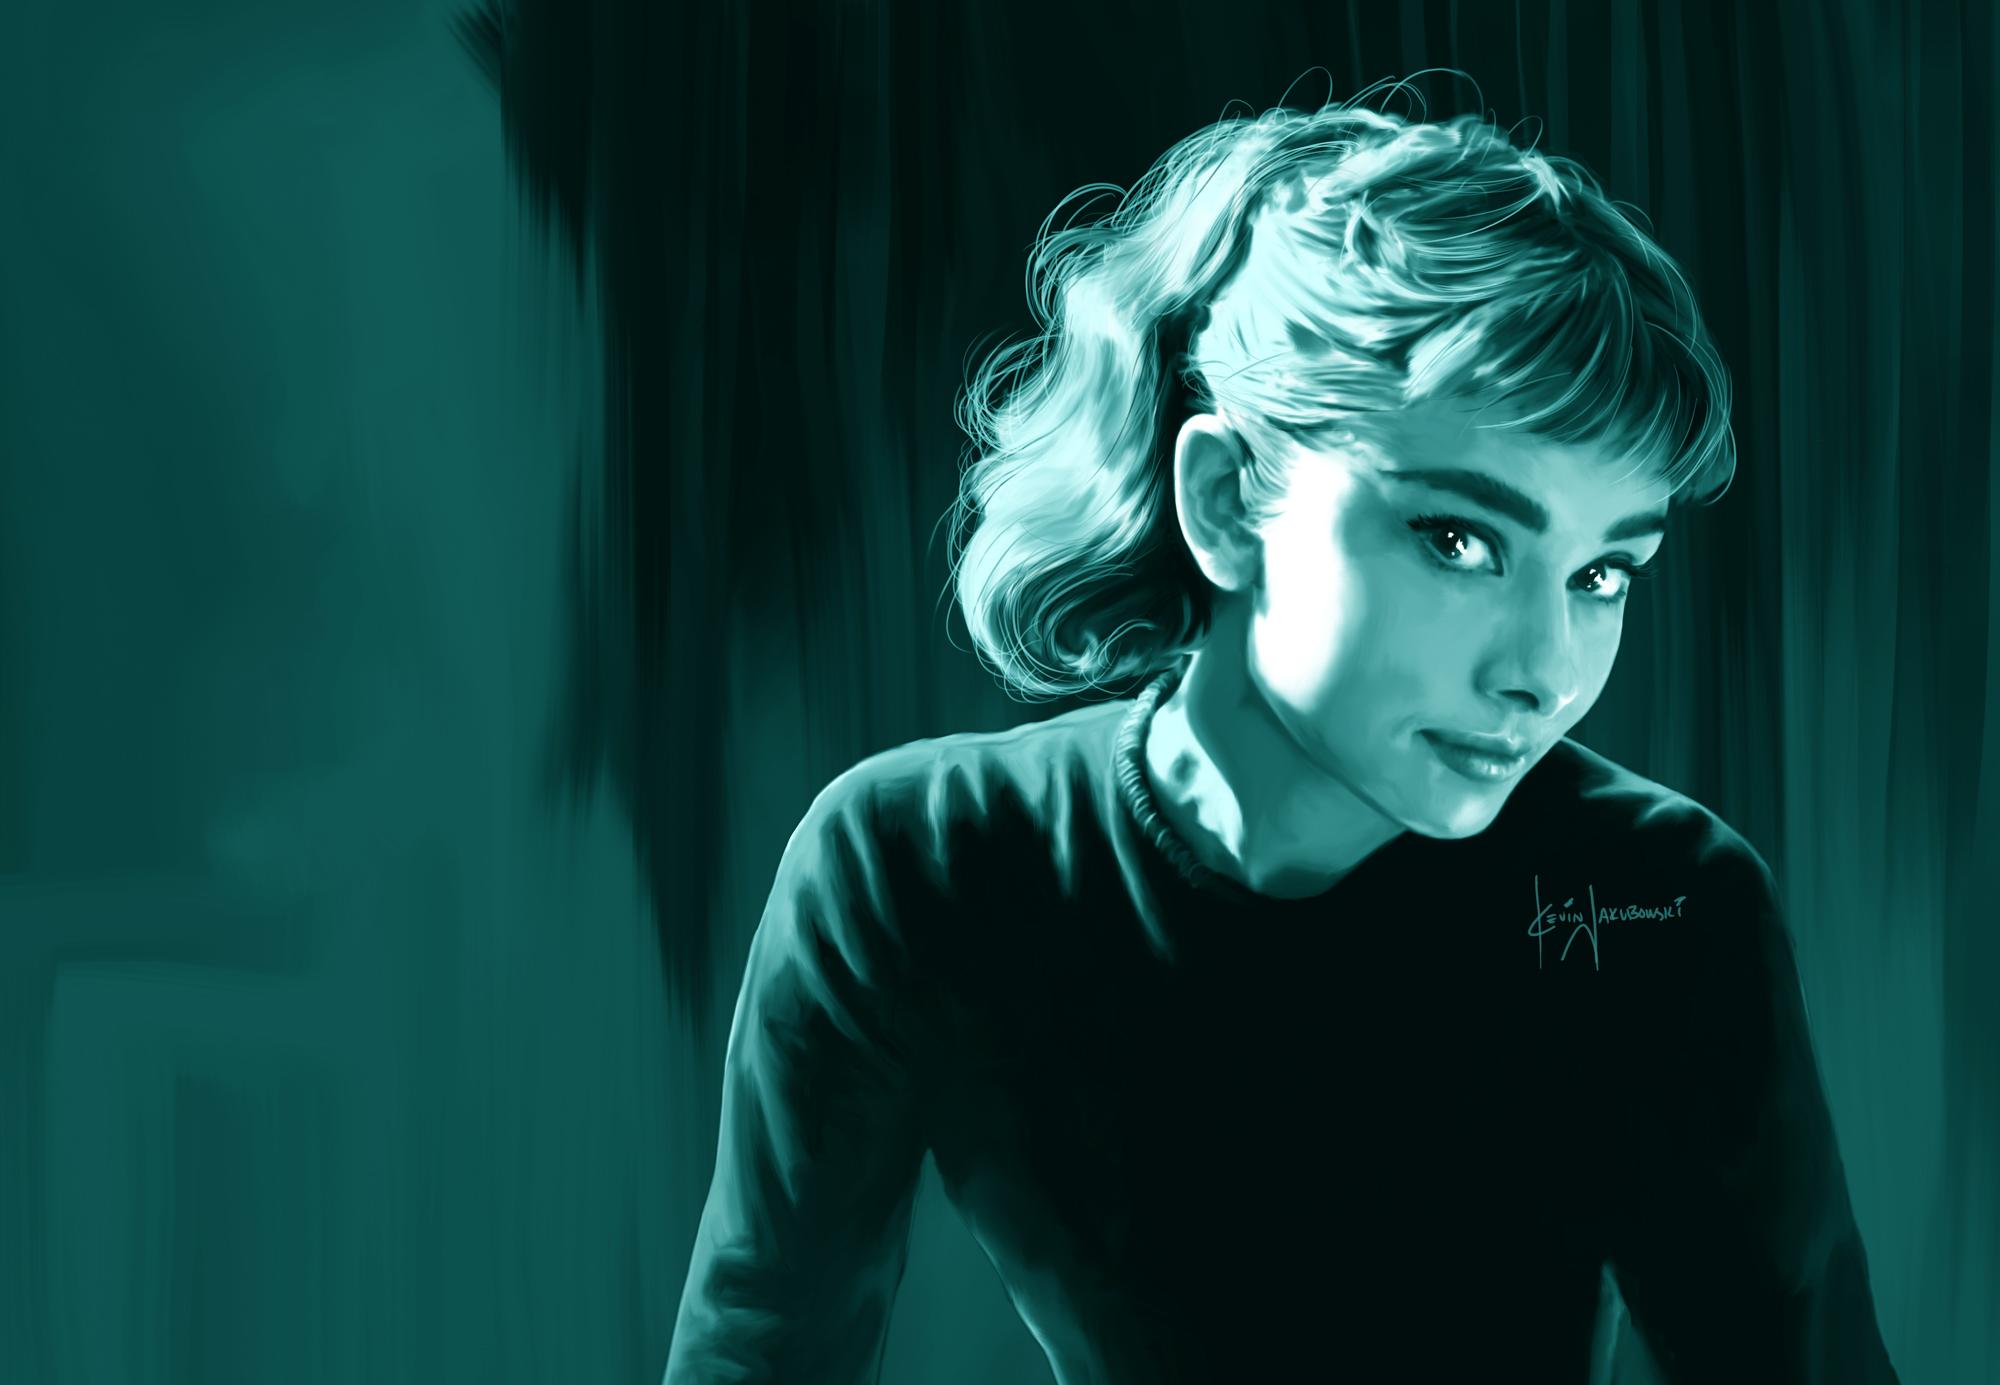 AudreyHepburn-2000px.jpg